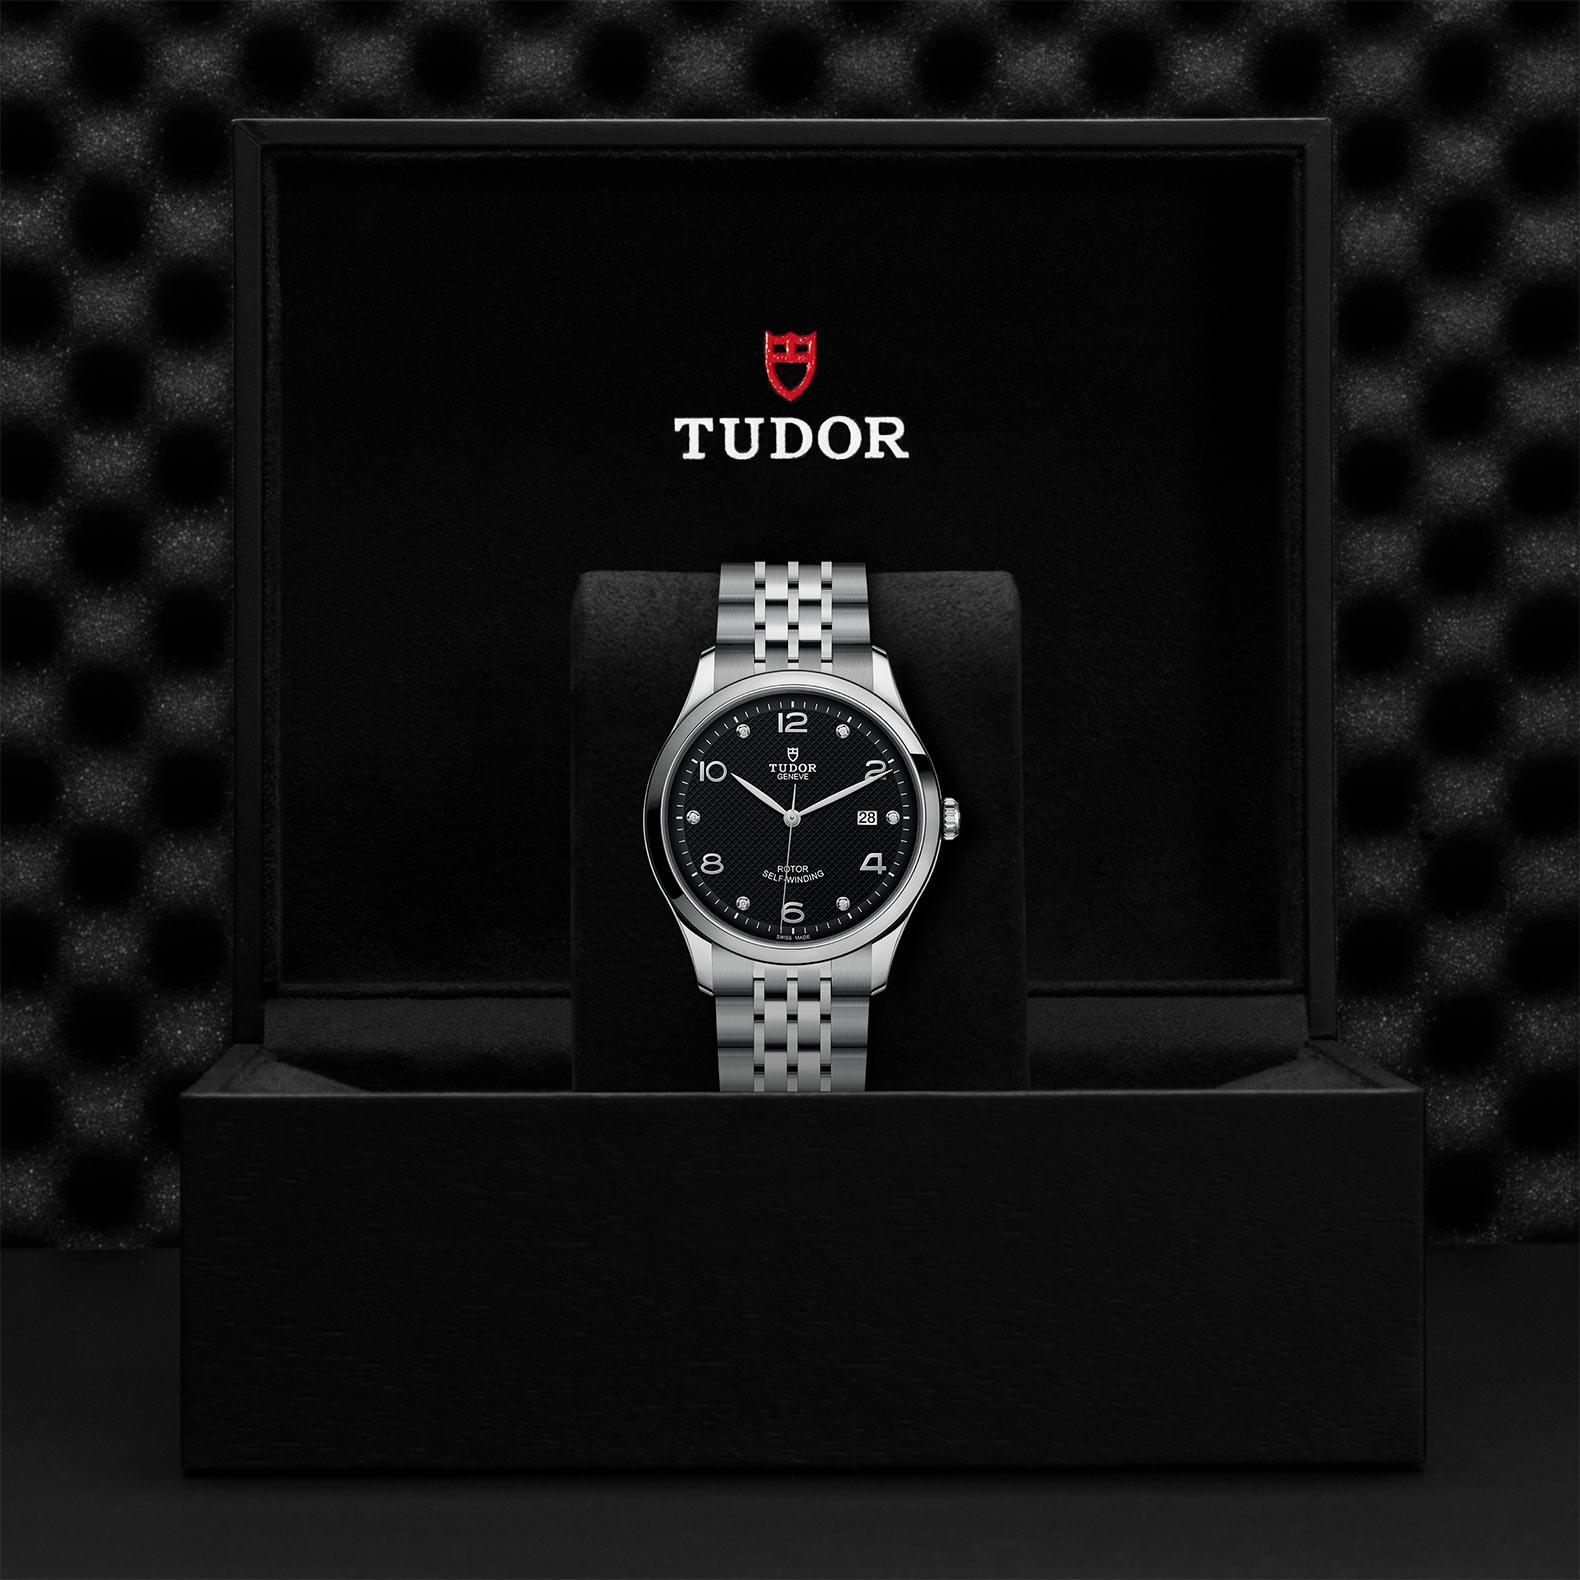 TUDOR 1926 M91650 0004 Presentationbox